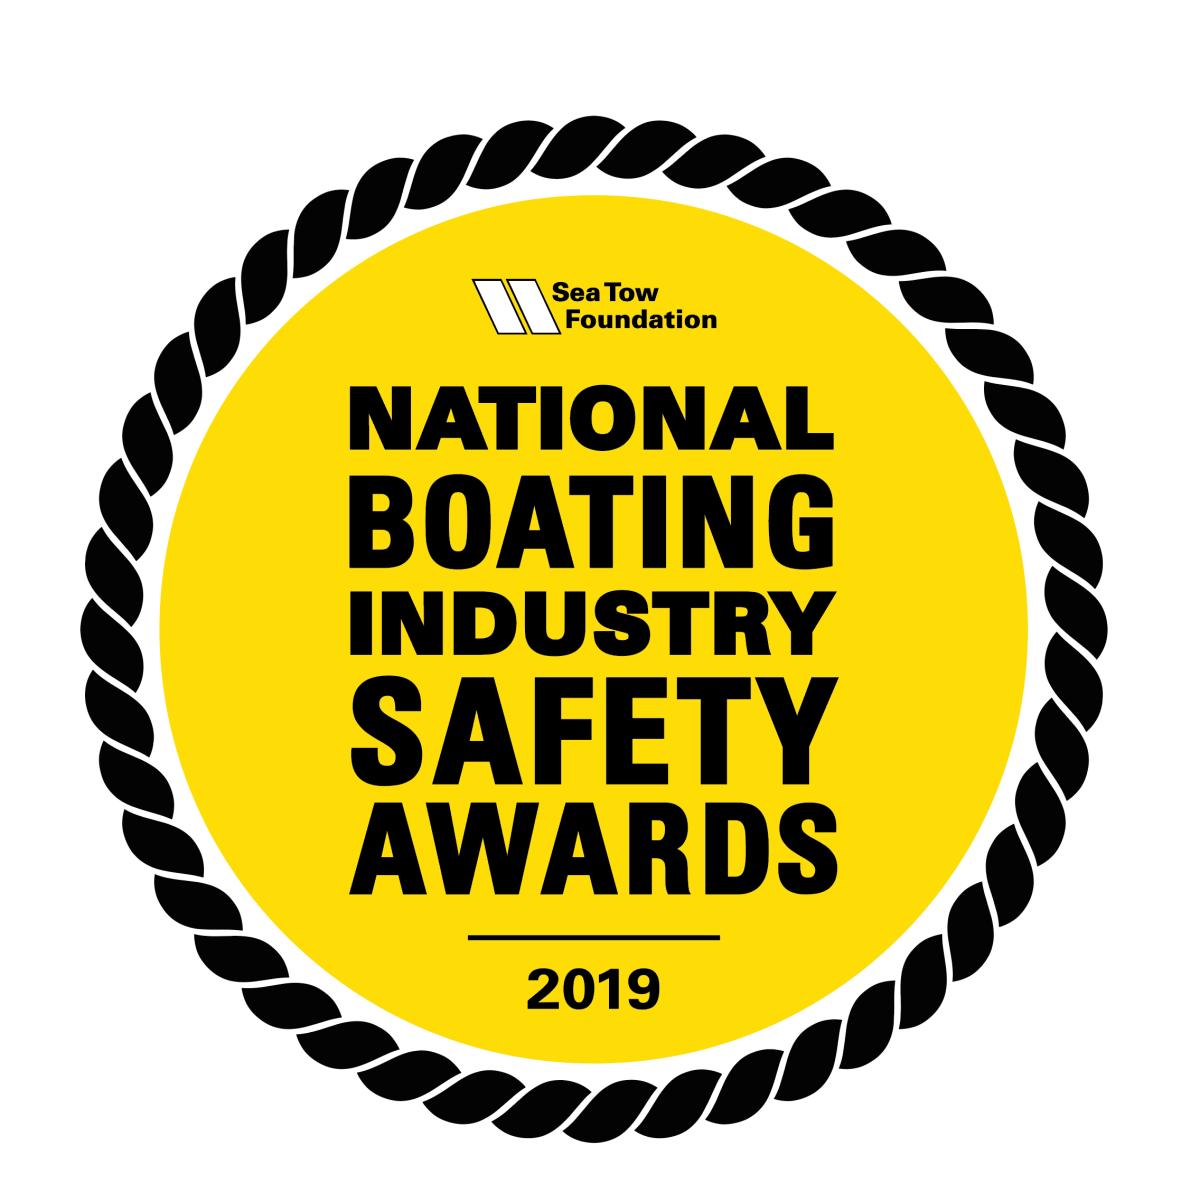 National Boating Industry Safety Awards Logo